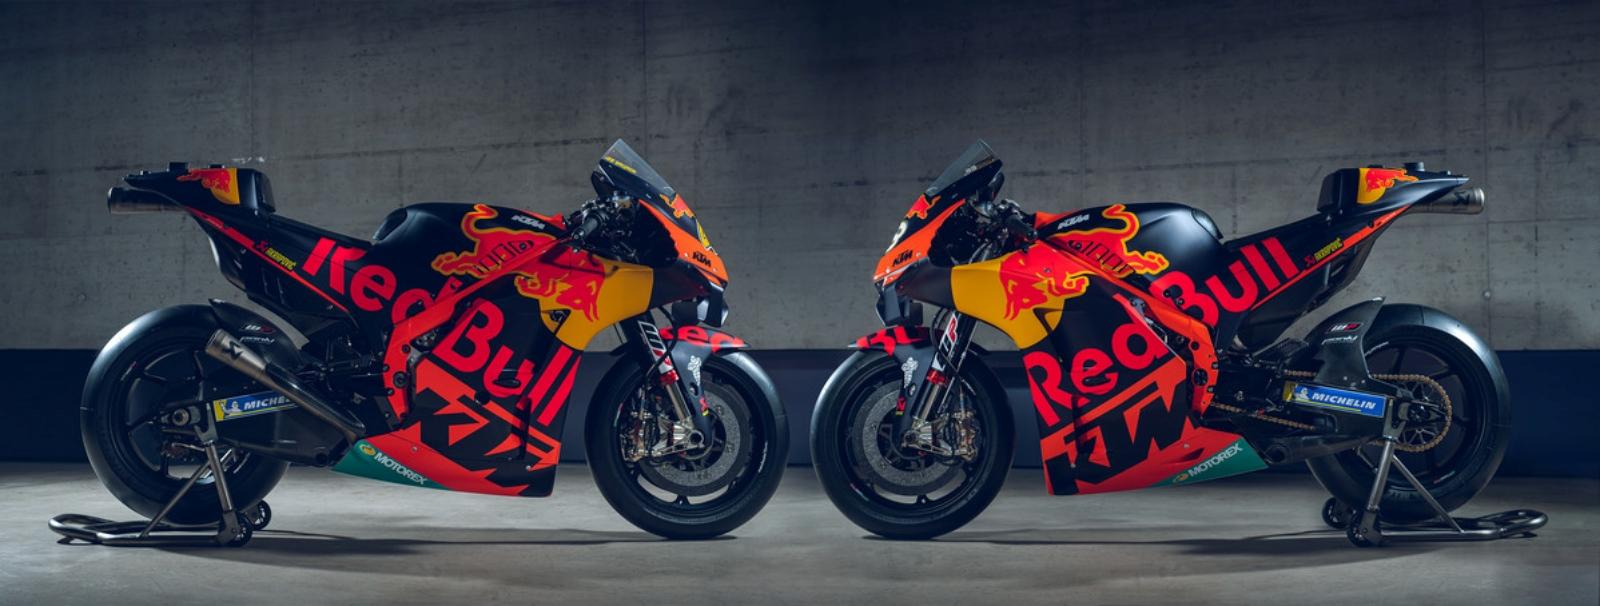 KTM RC16 Factory MotoGP 2020 - Pol Espargaró & Brad Binder